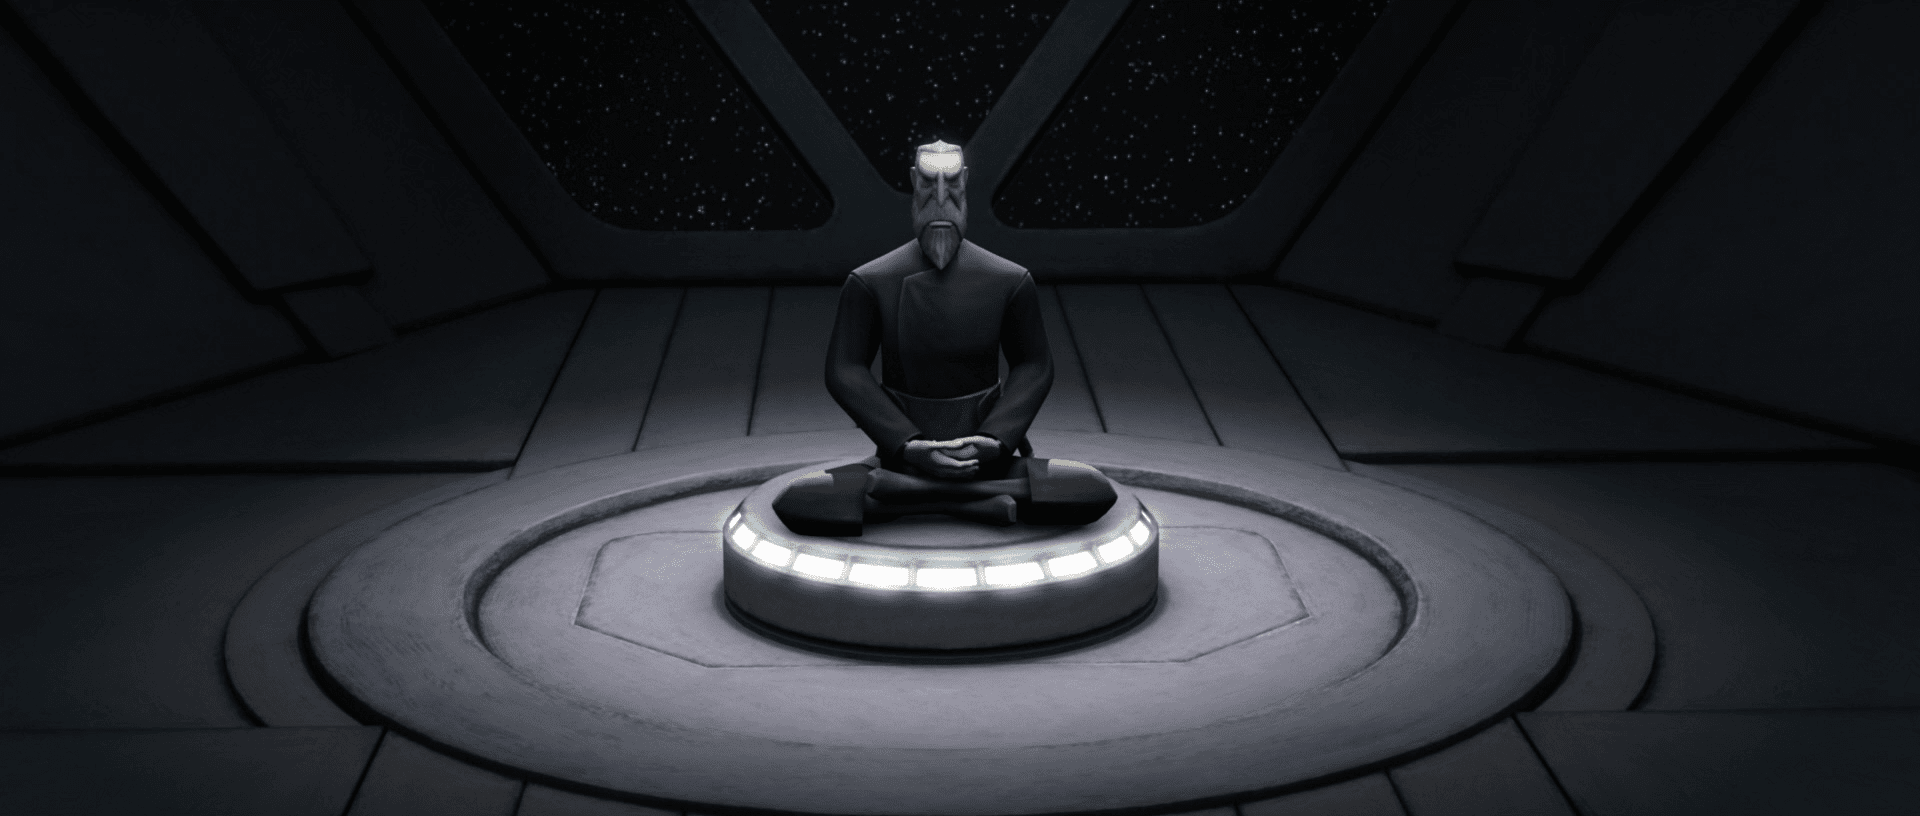 dookus_meditation_chamber